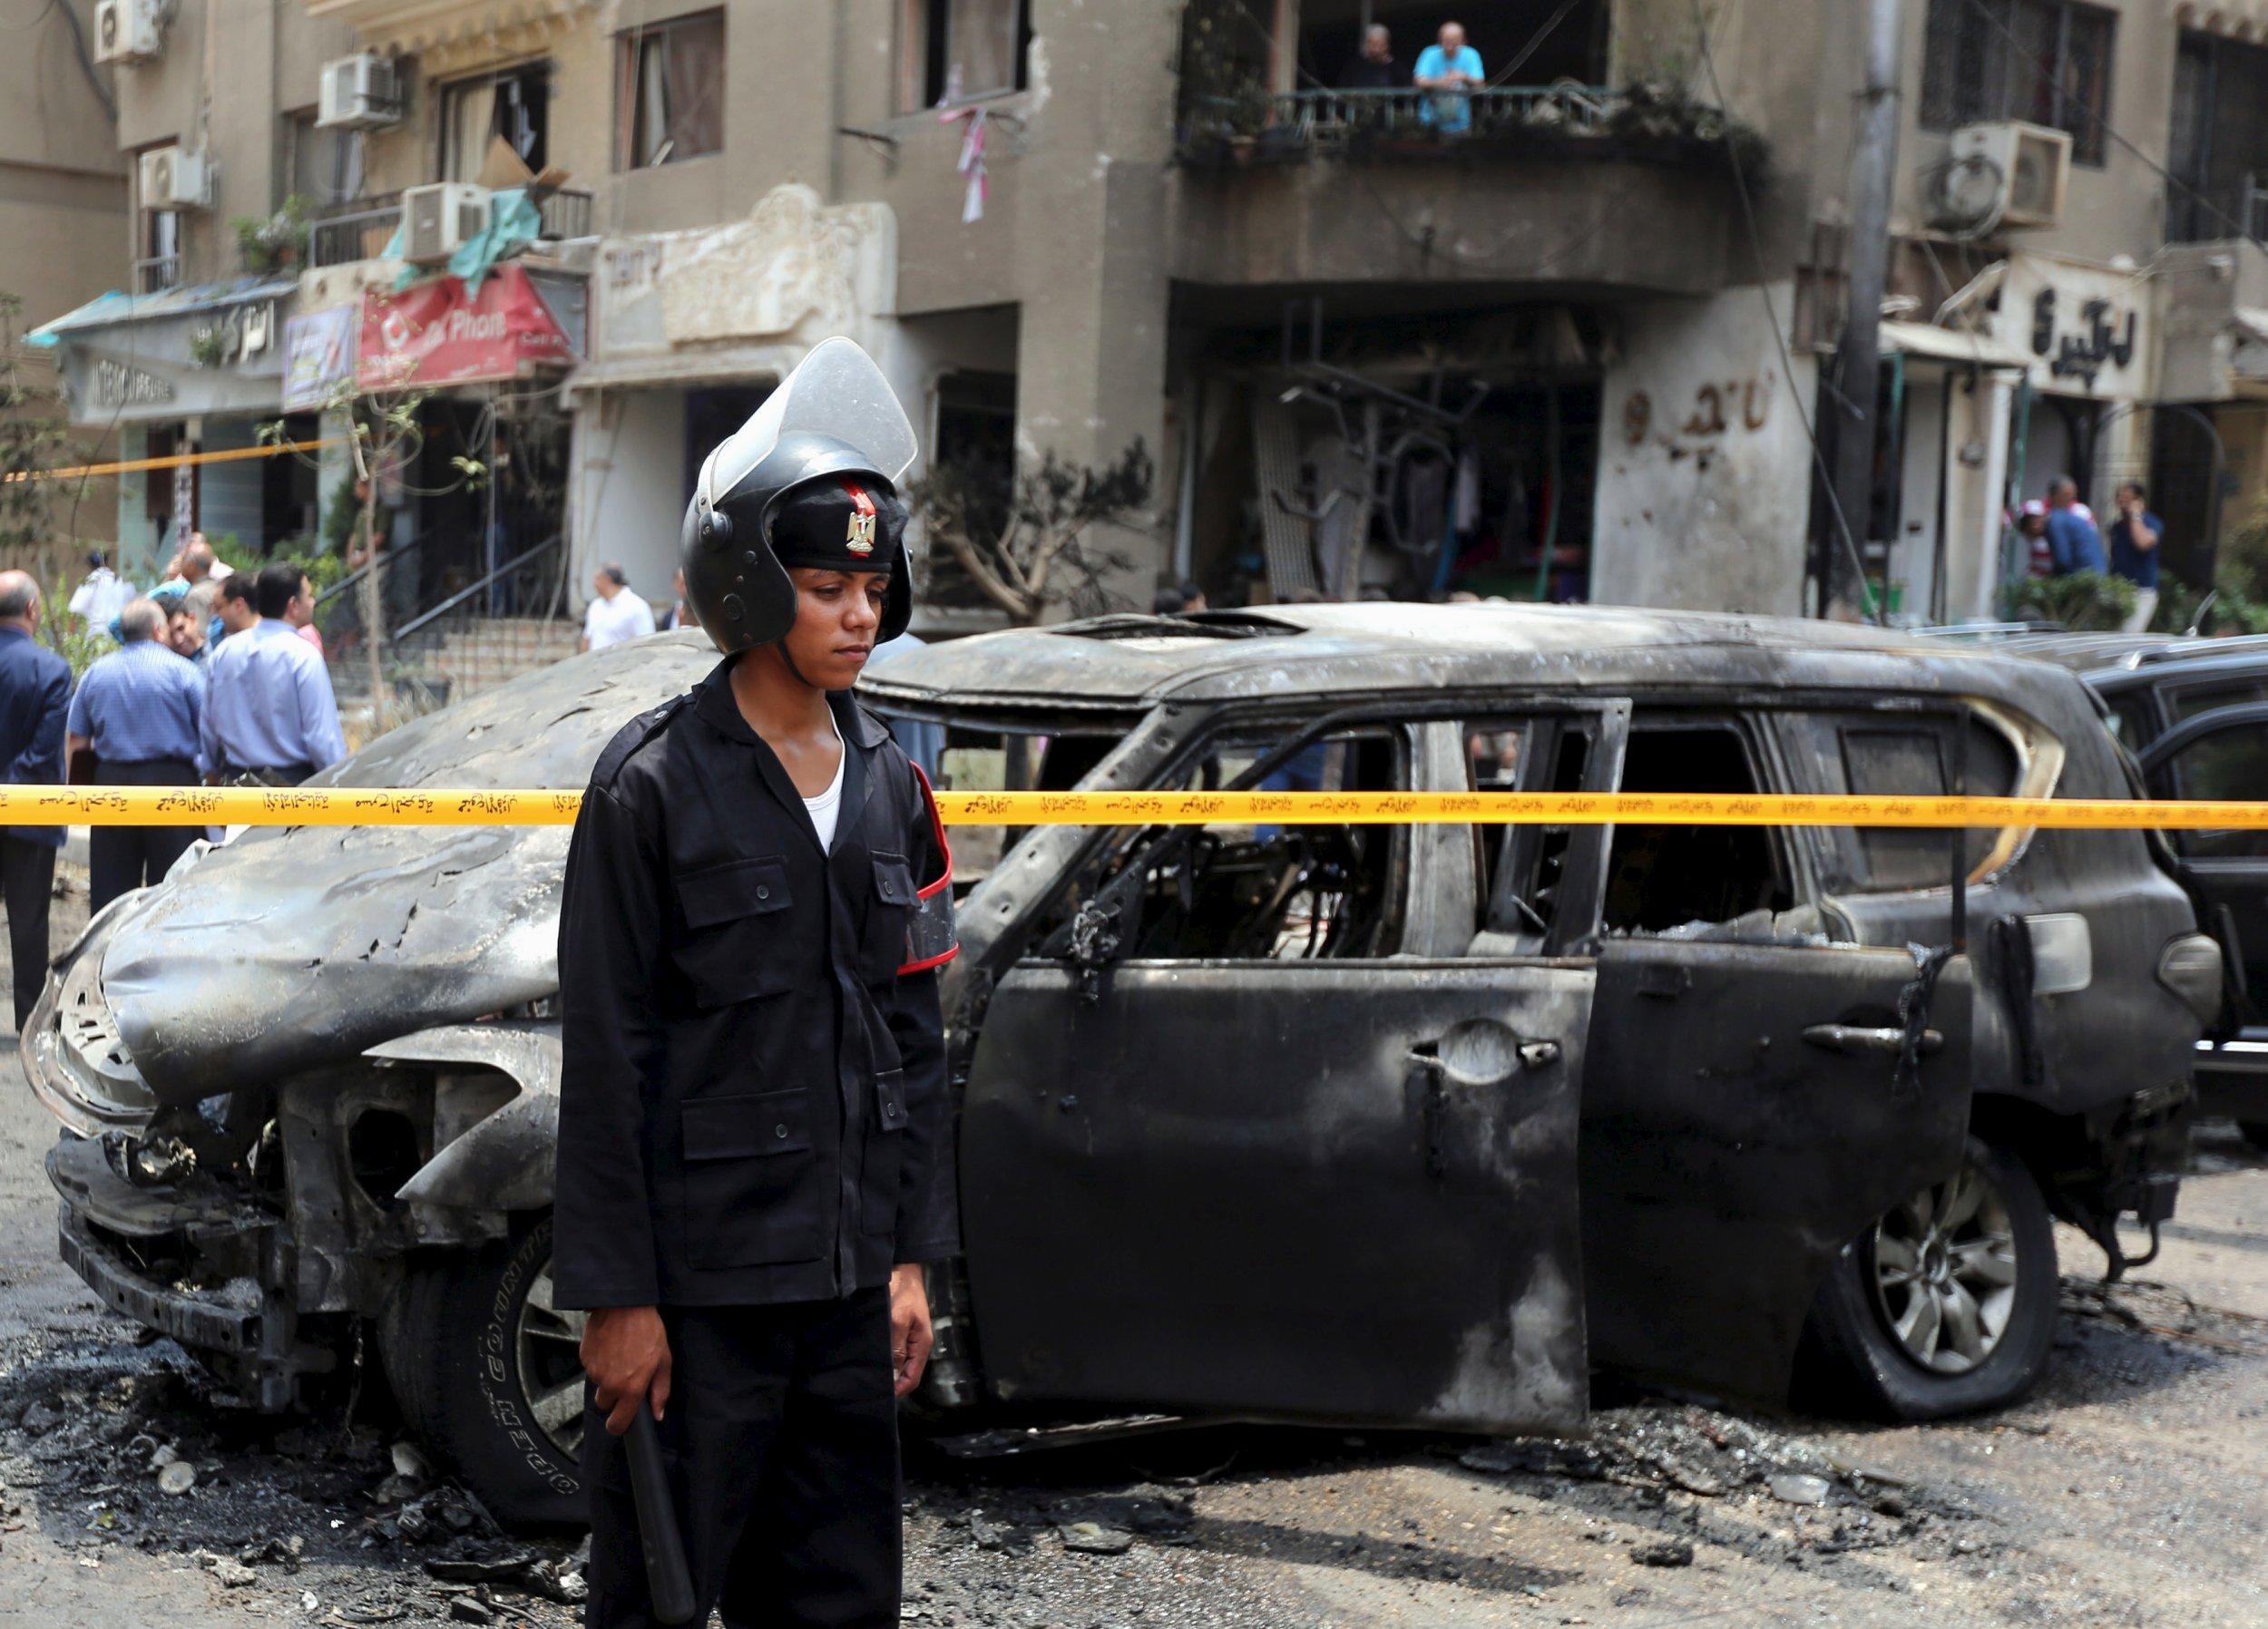 2015-06-30T144437Z_1_LYNXNPEB5T0RW_RTROPTP_4_EGYPT-VIOLENCE